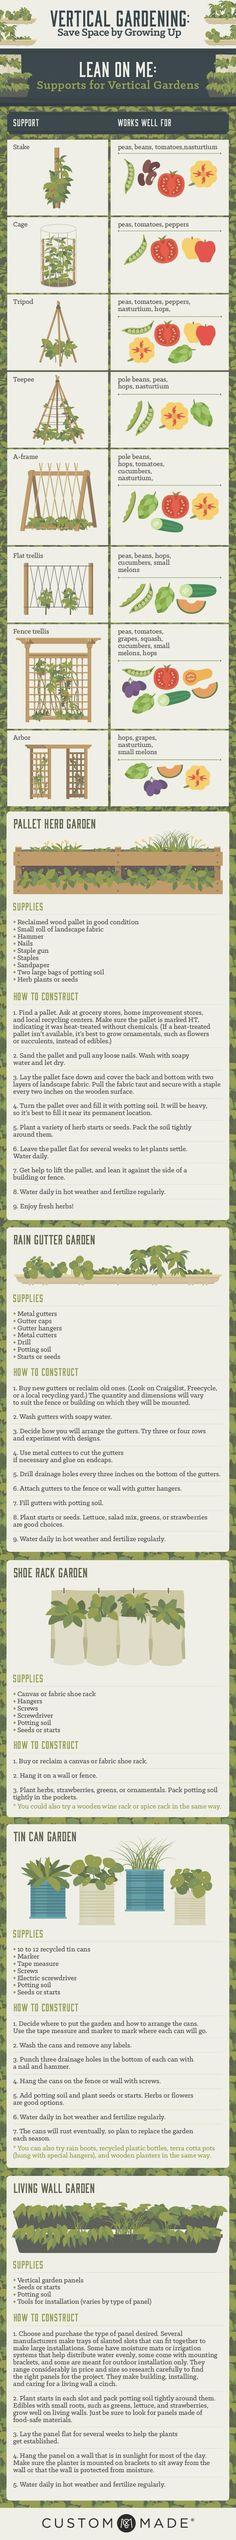 Vertical Gardening #gardeningbasics #gardeningtips #Vegetablegardenbasics